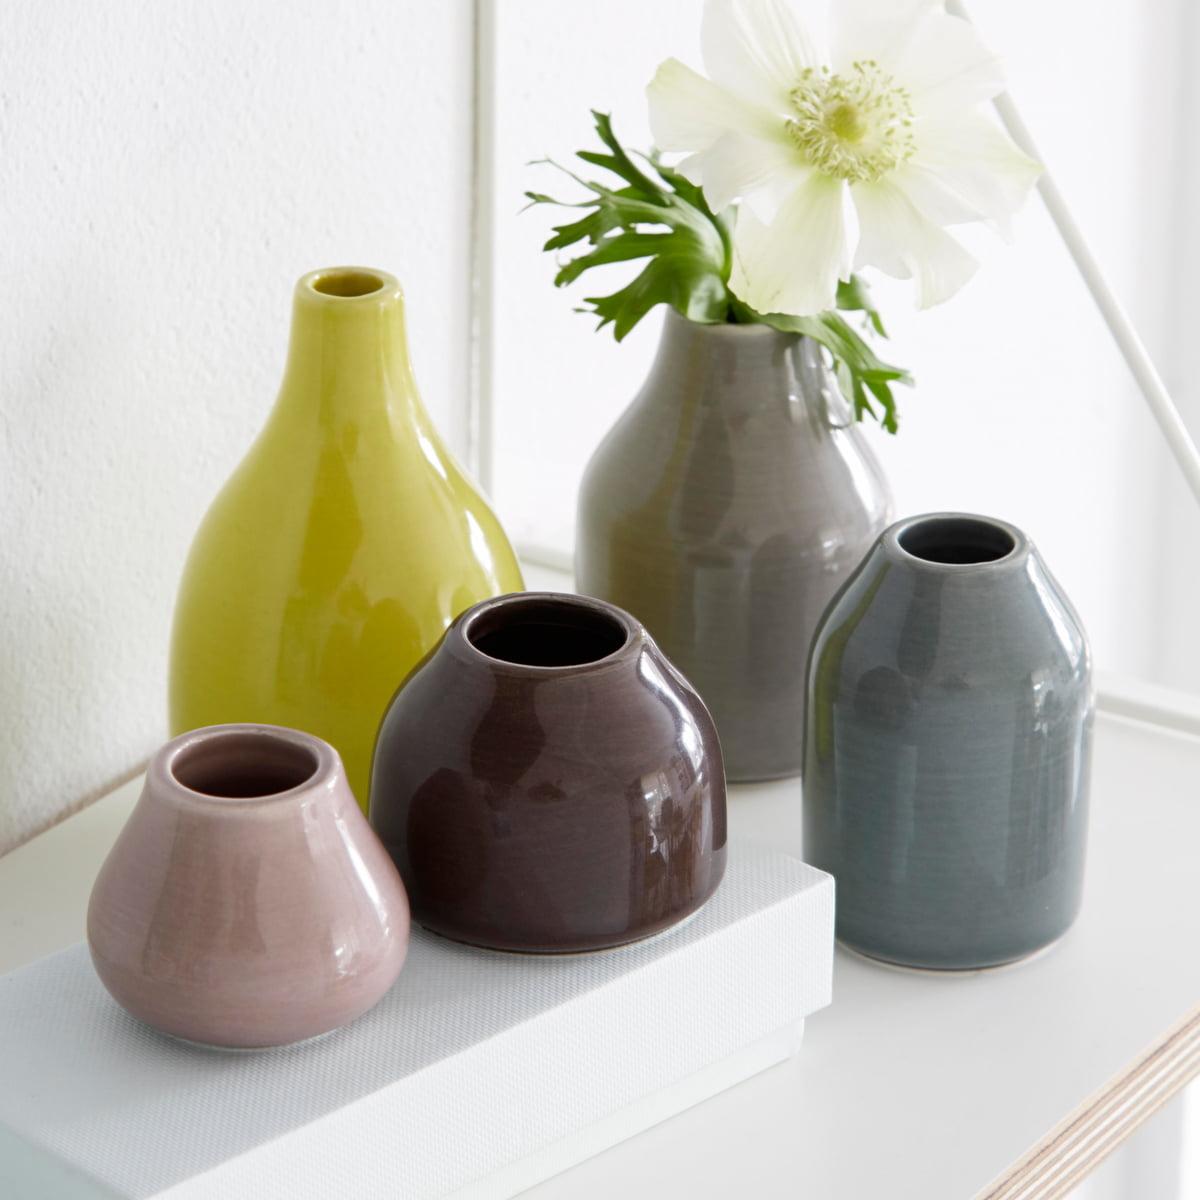 botanica vases by kähler in the shop - glazed ceramic vases